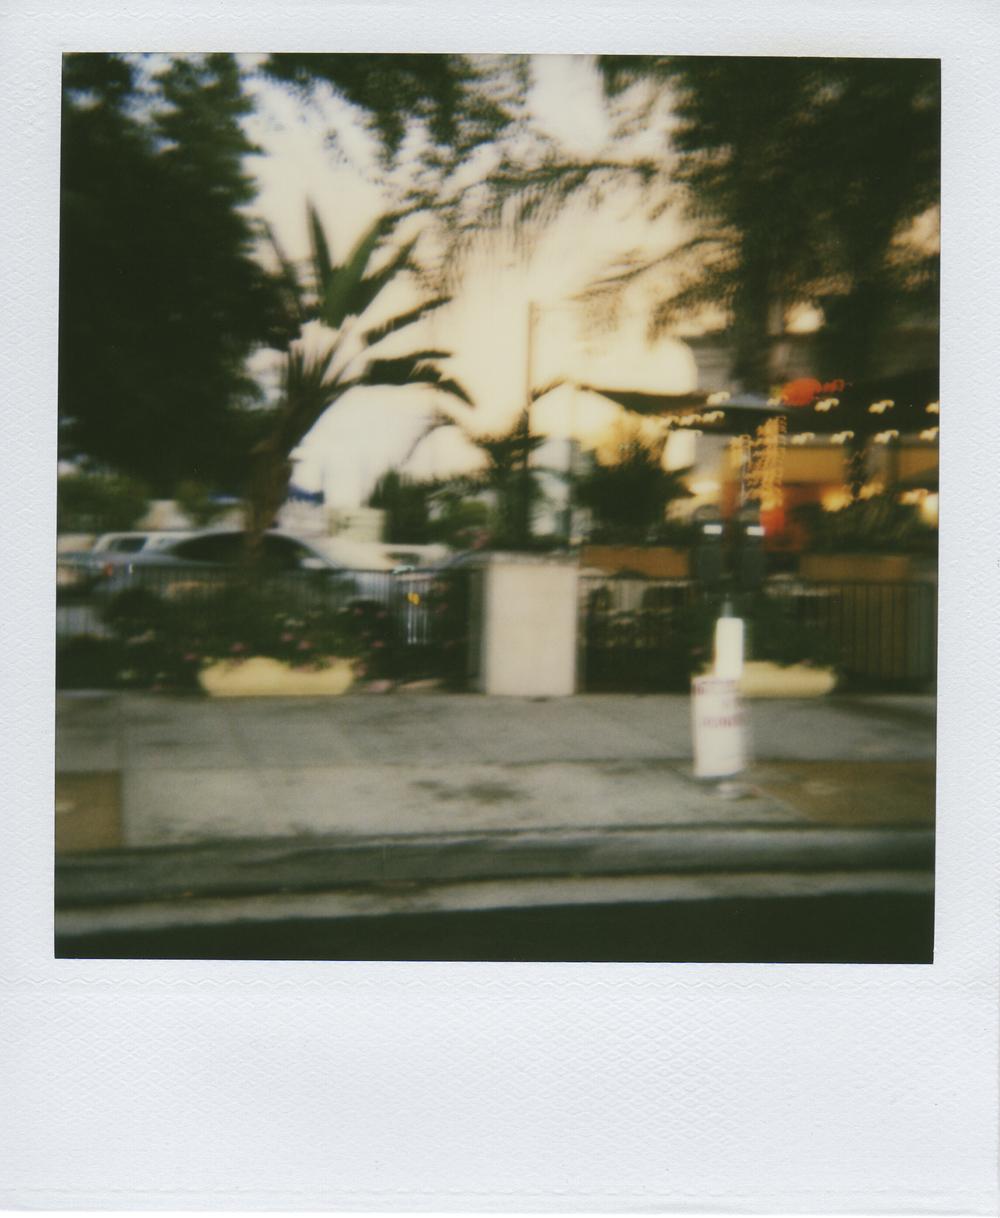 jlaurence-polaroid-063.jpg